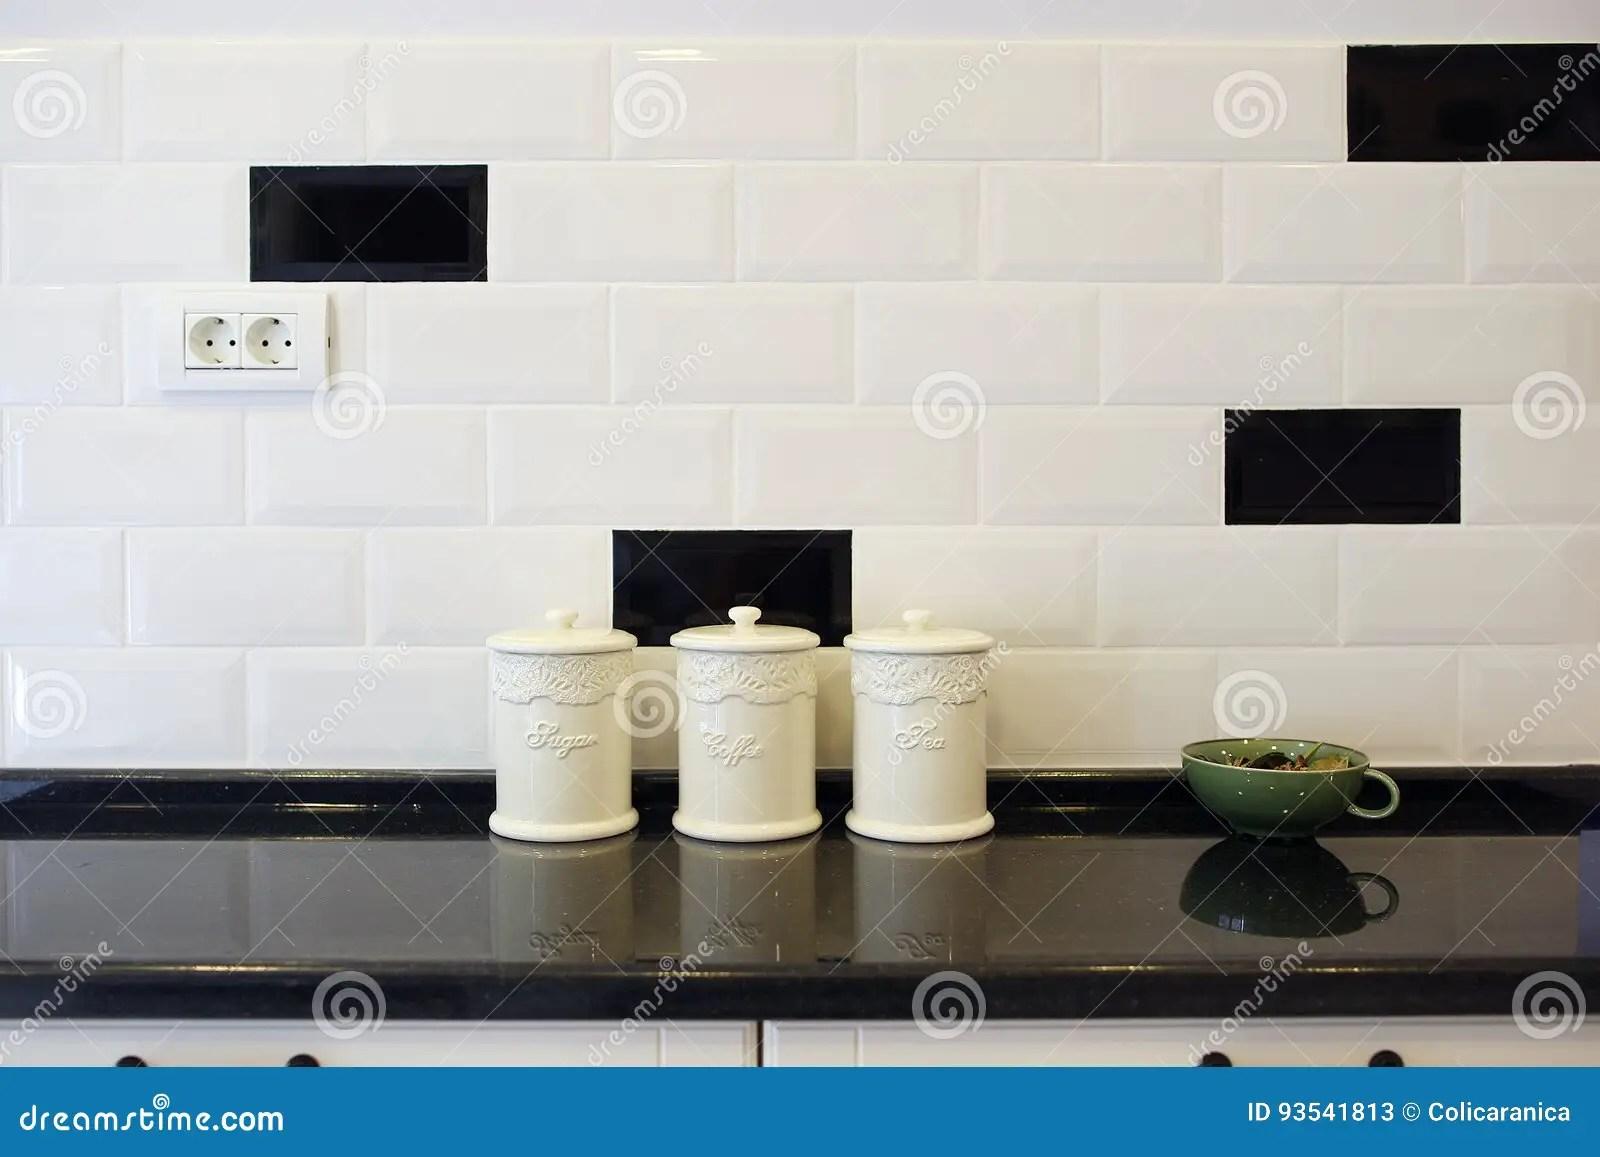 luxury kitchen faucets table island 豪华厨房 糖 茶和咖啡罐库存图片 图片包括有龙头 地毯 厨房 闪亮 茶和咖啡罐